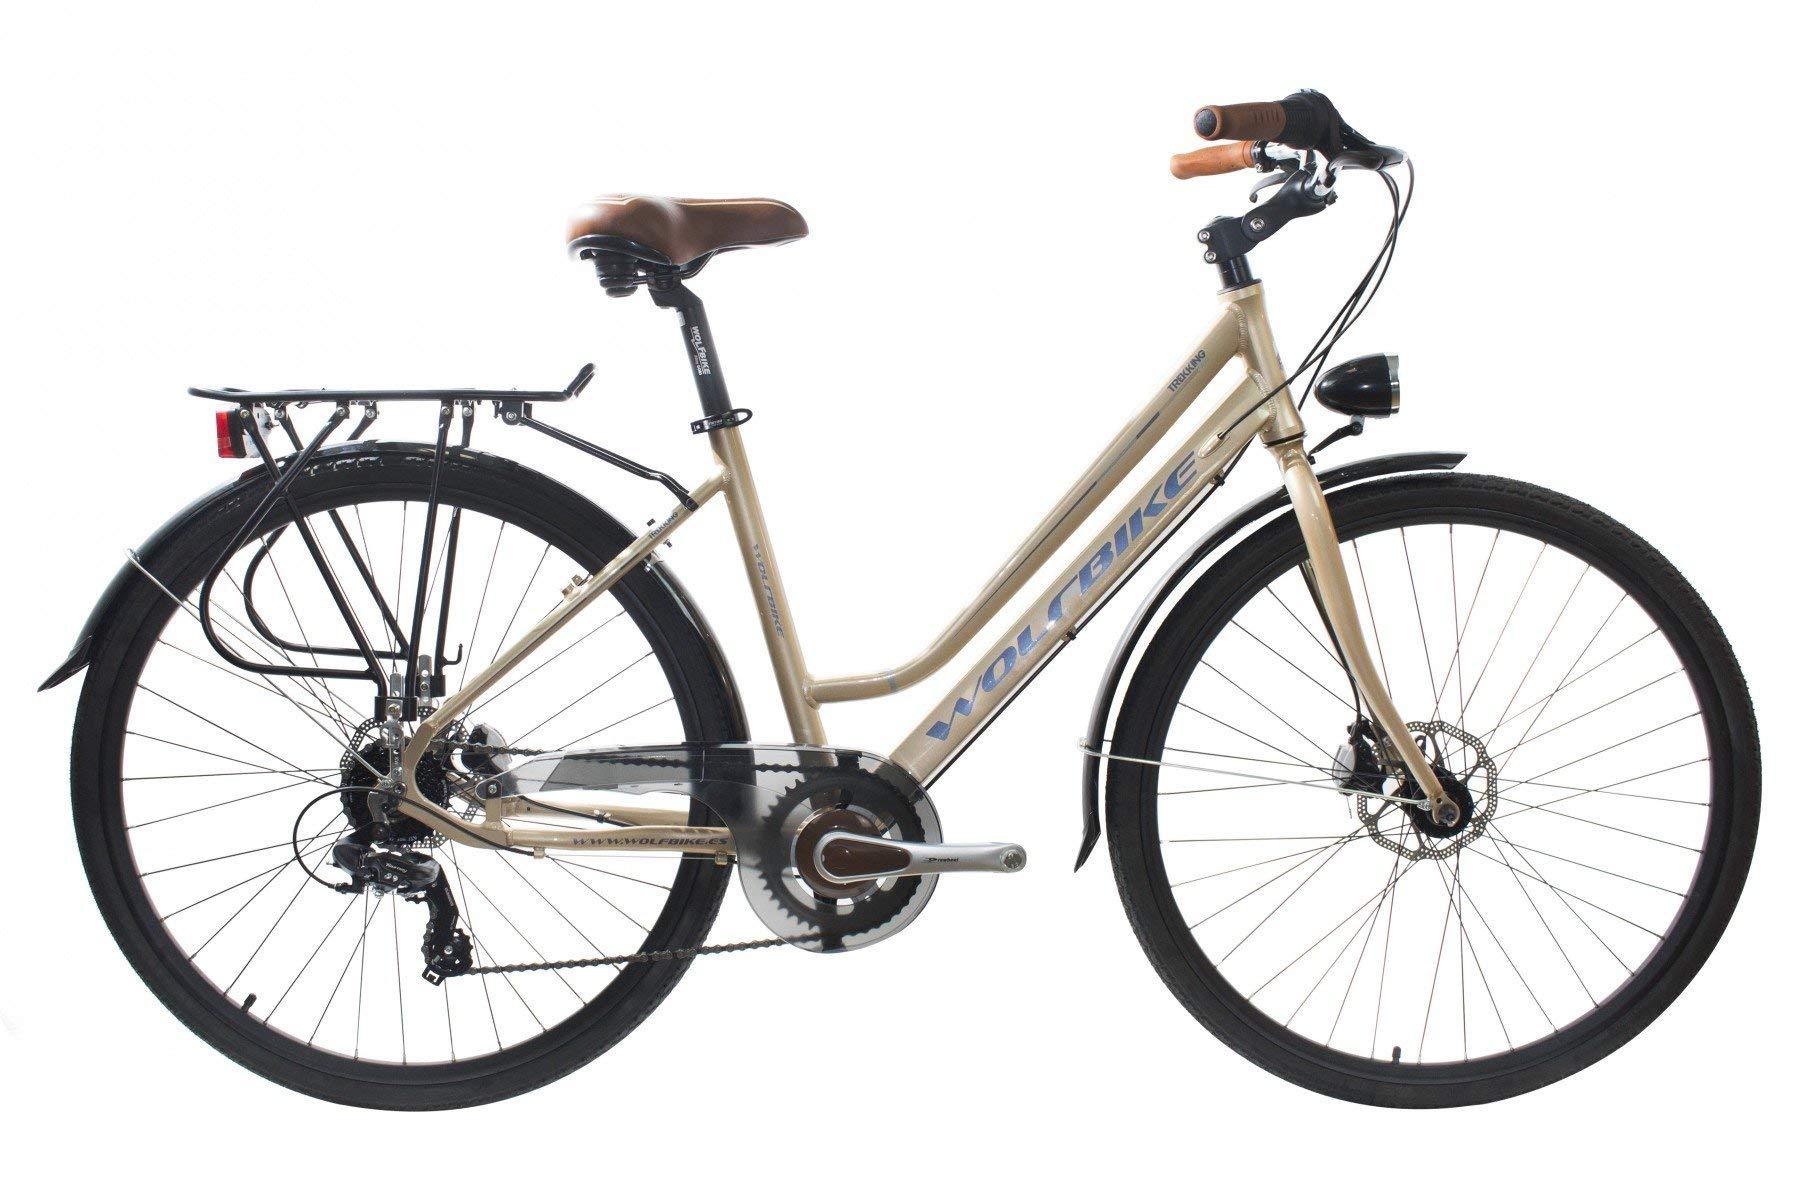 WOLFBIKE Trekking S700 7V DM Marron T18 Bicicleta, Adultos Unisex ...